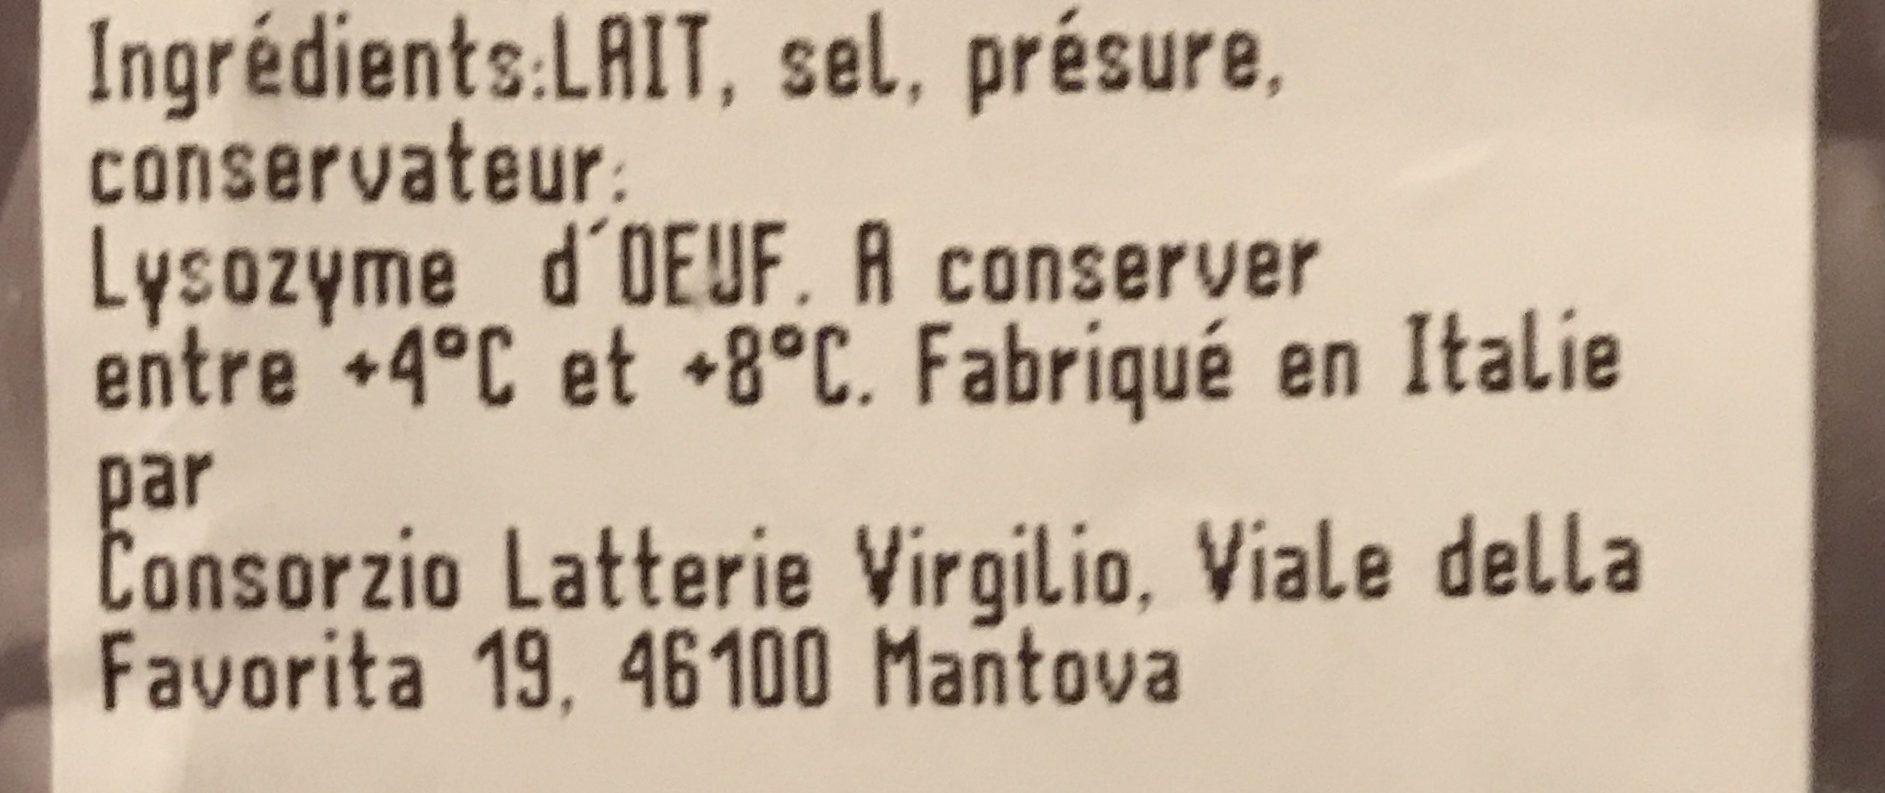 Grana panado - Ingrediënten